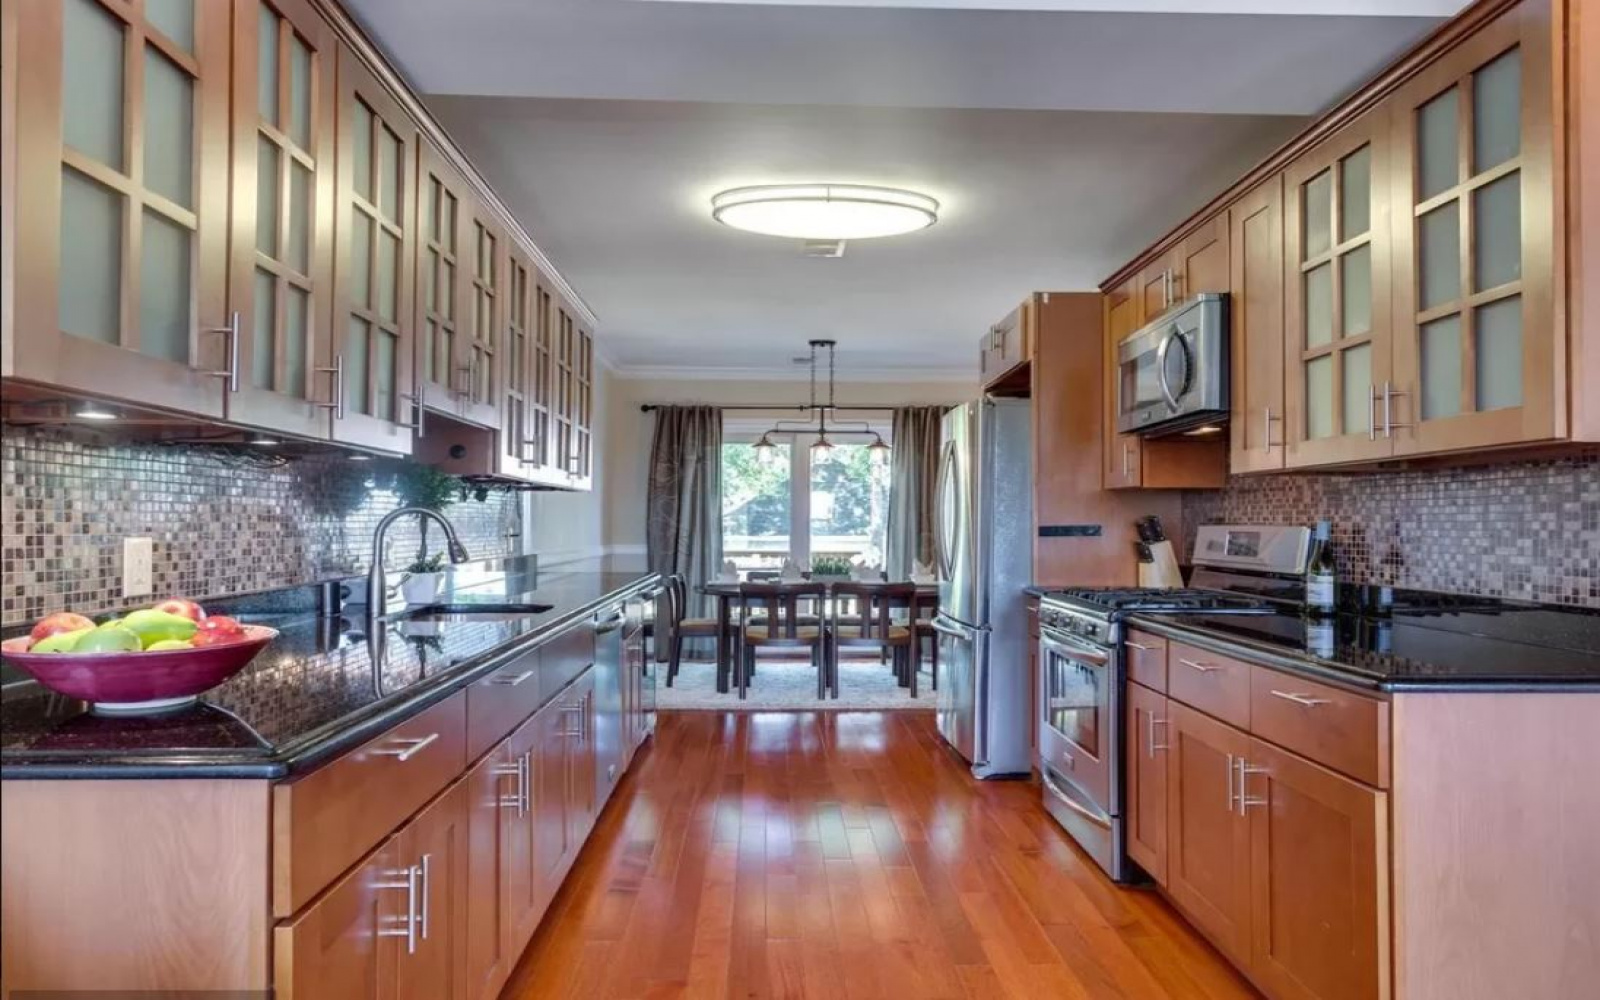 308 16th St NE,Washington,District Of Columbia 20002,2 Bedrooms Bedrooms,1 BathroomBathrooms,Apartment,16th St,1296